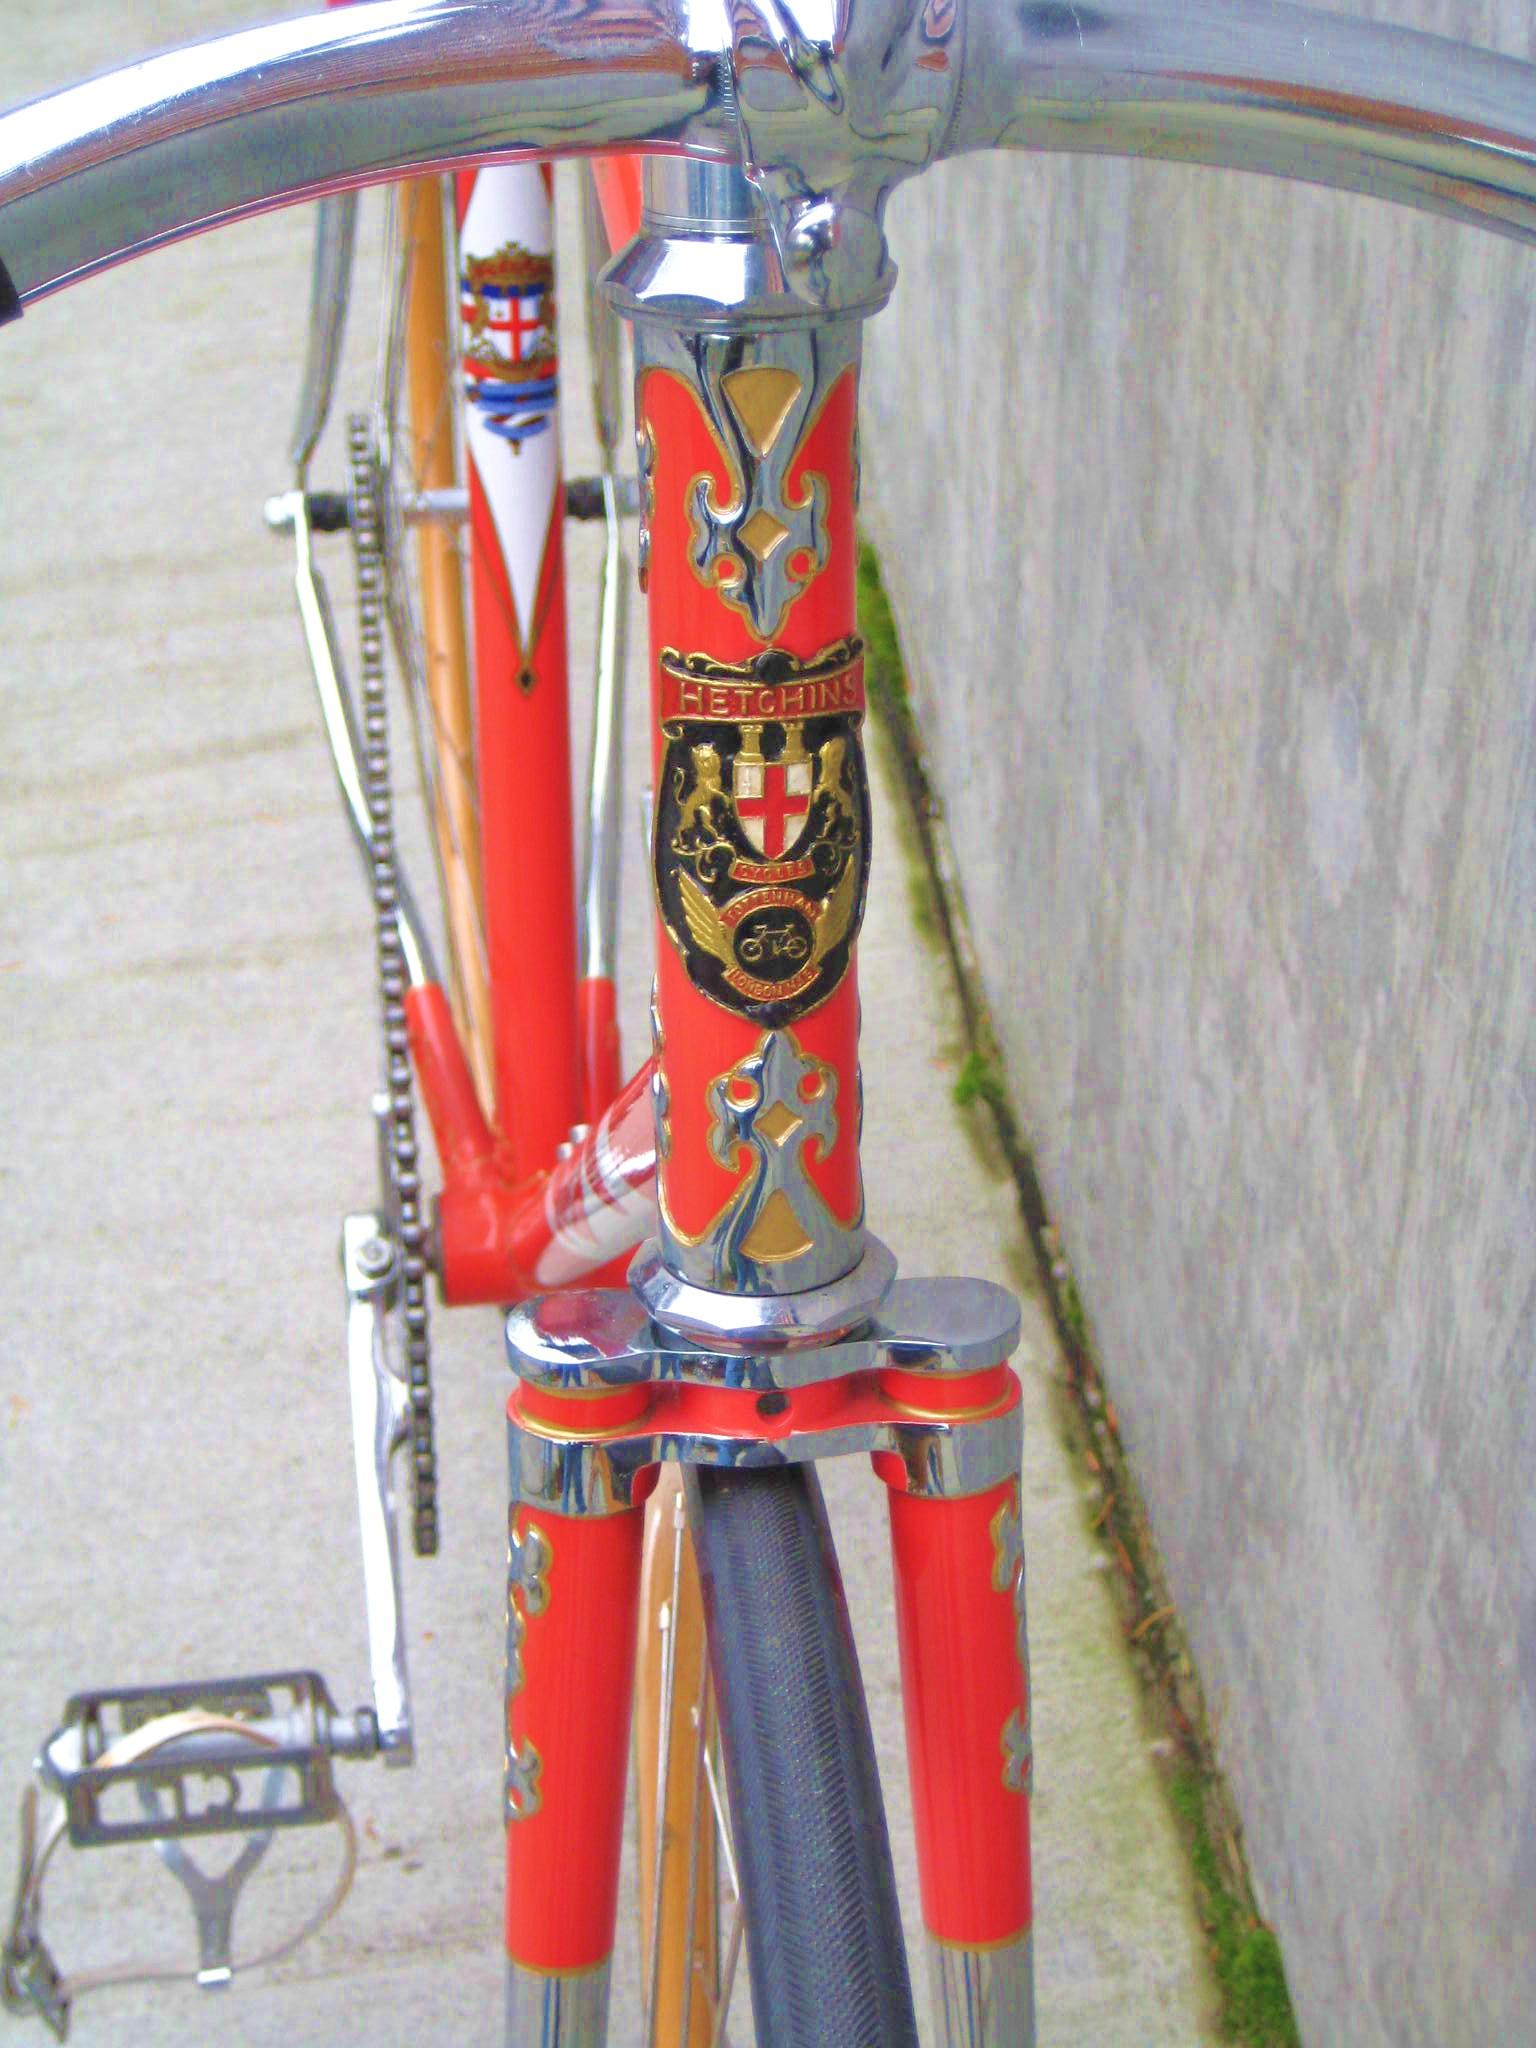 hetchins millenium track bike classic cycle bainbridge. Black Bedroom Furniture Sets. Home Design Ideas